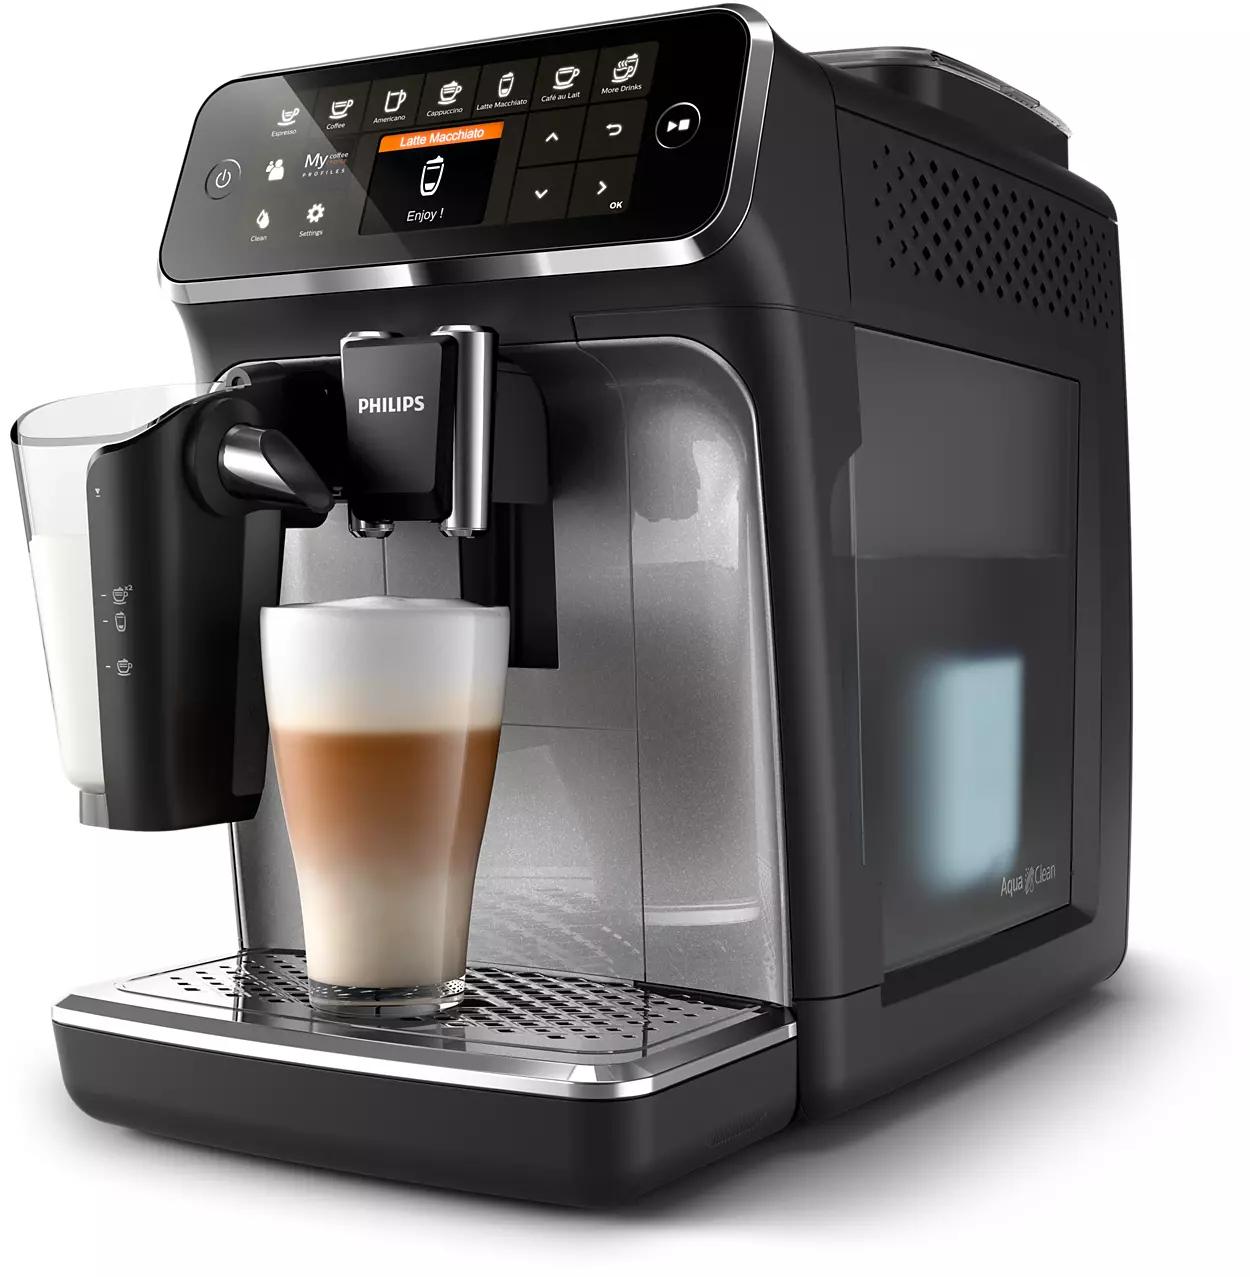 Philips 4300 Series Volautomatische espressomachines EP4346/70